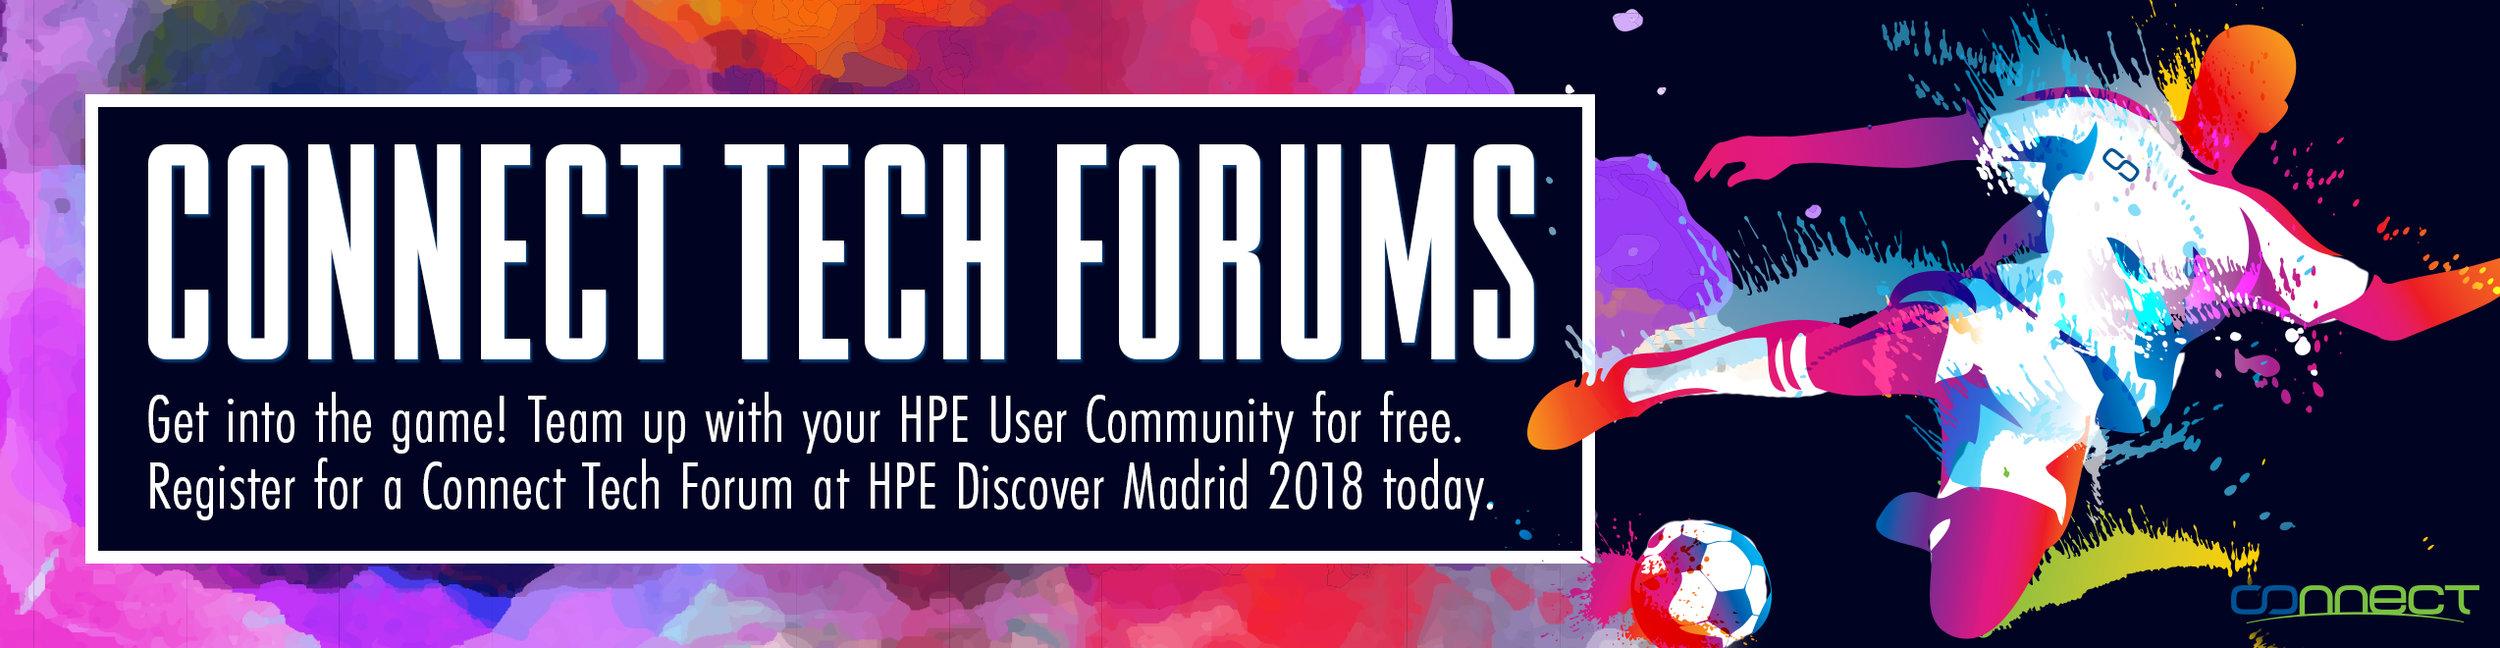 ConnectTechForum_WebsiteBanner_Madrid2018.jpg